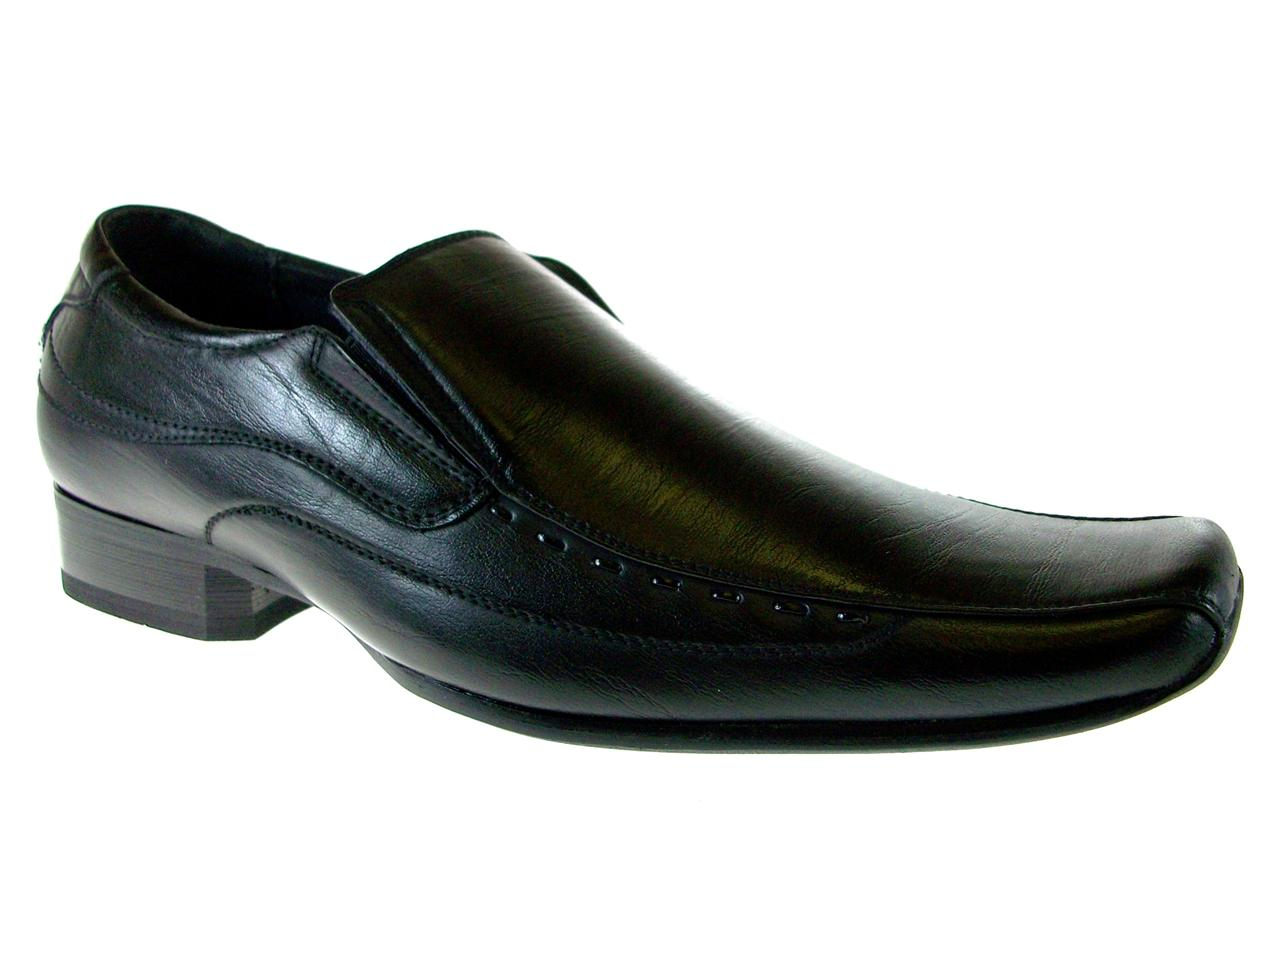 delli aldo mens slip on loafers dress classic shoes w